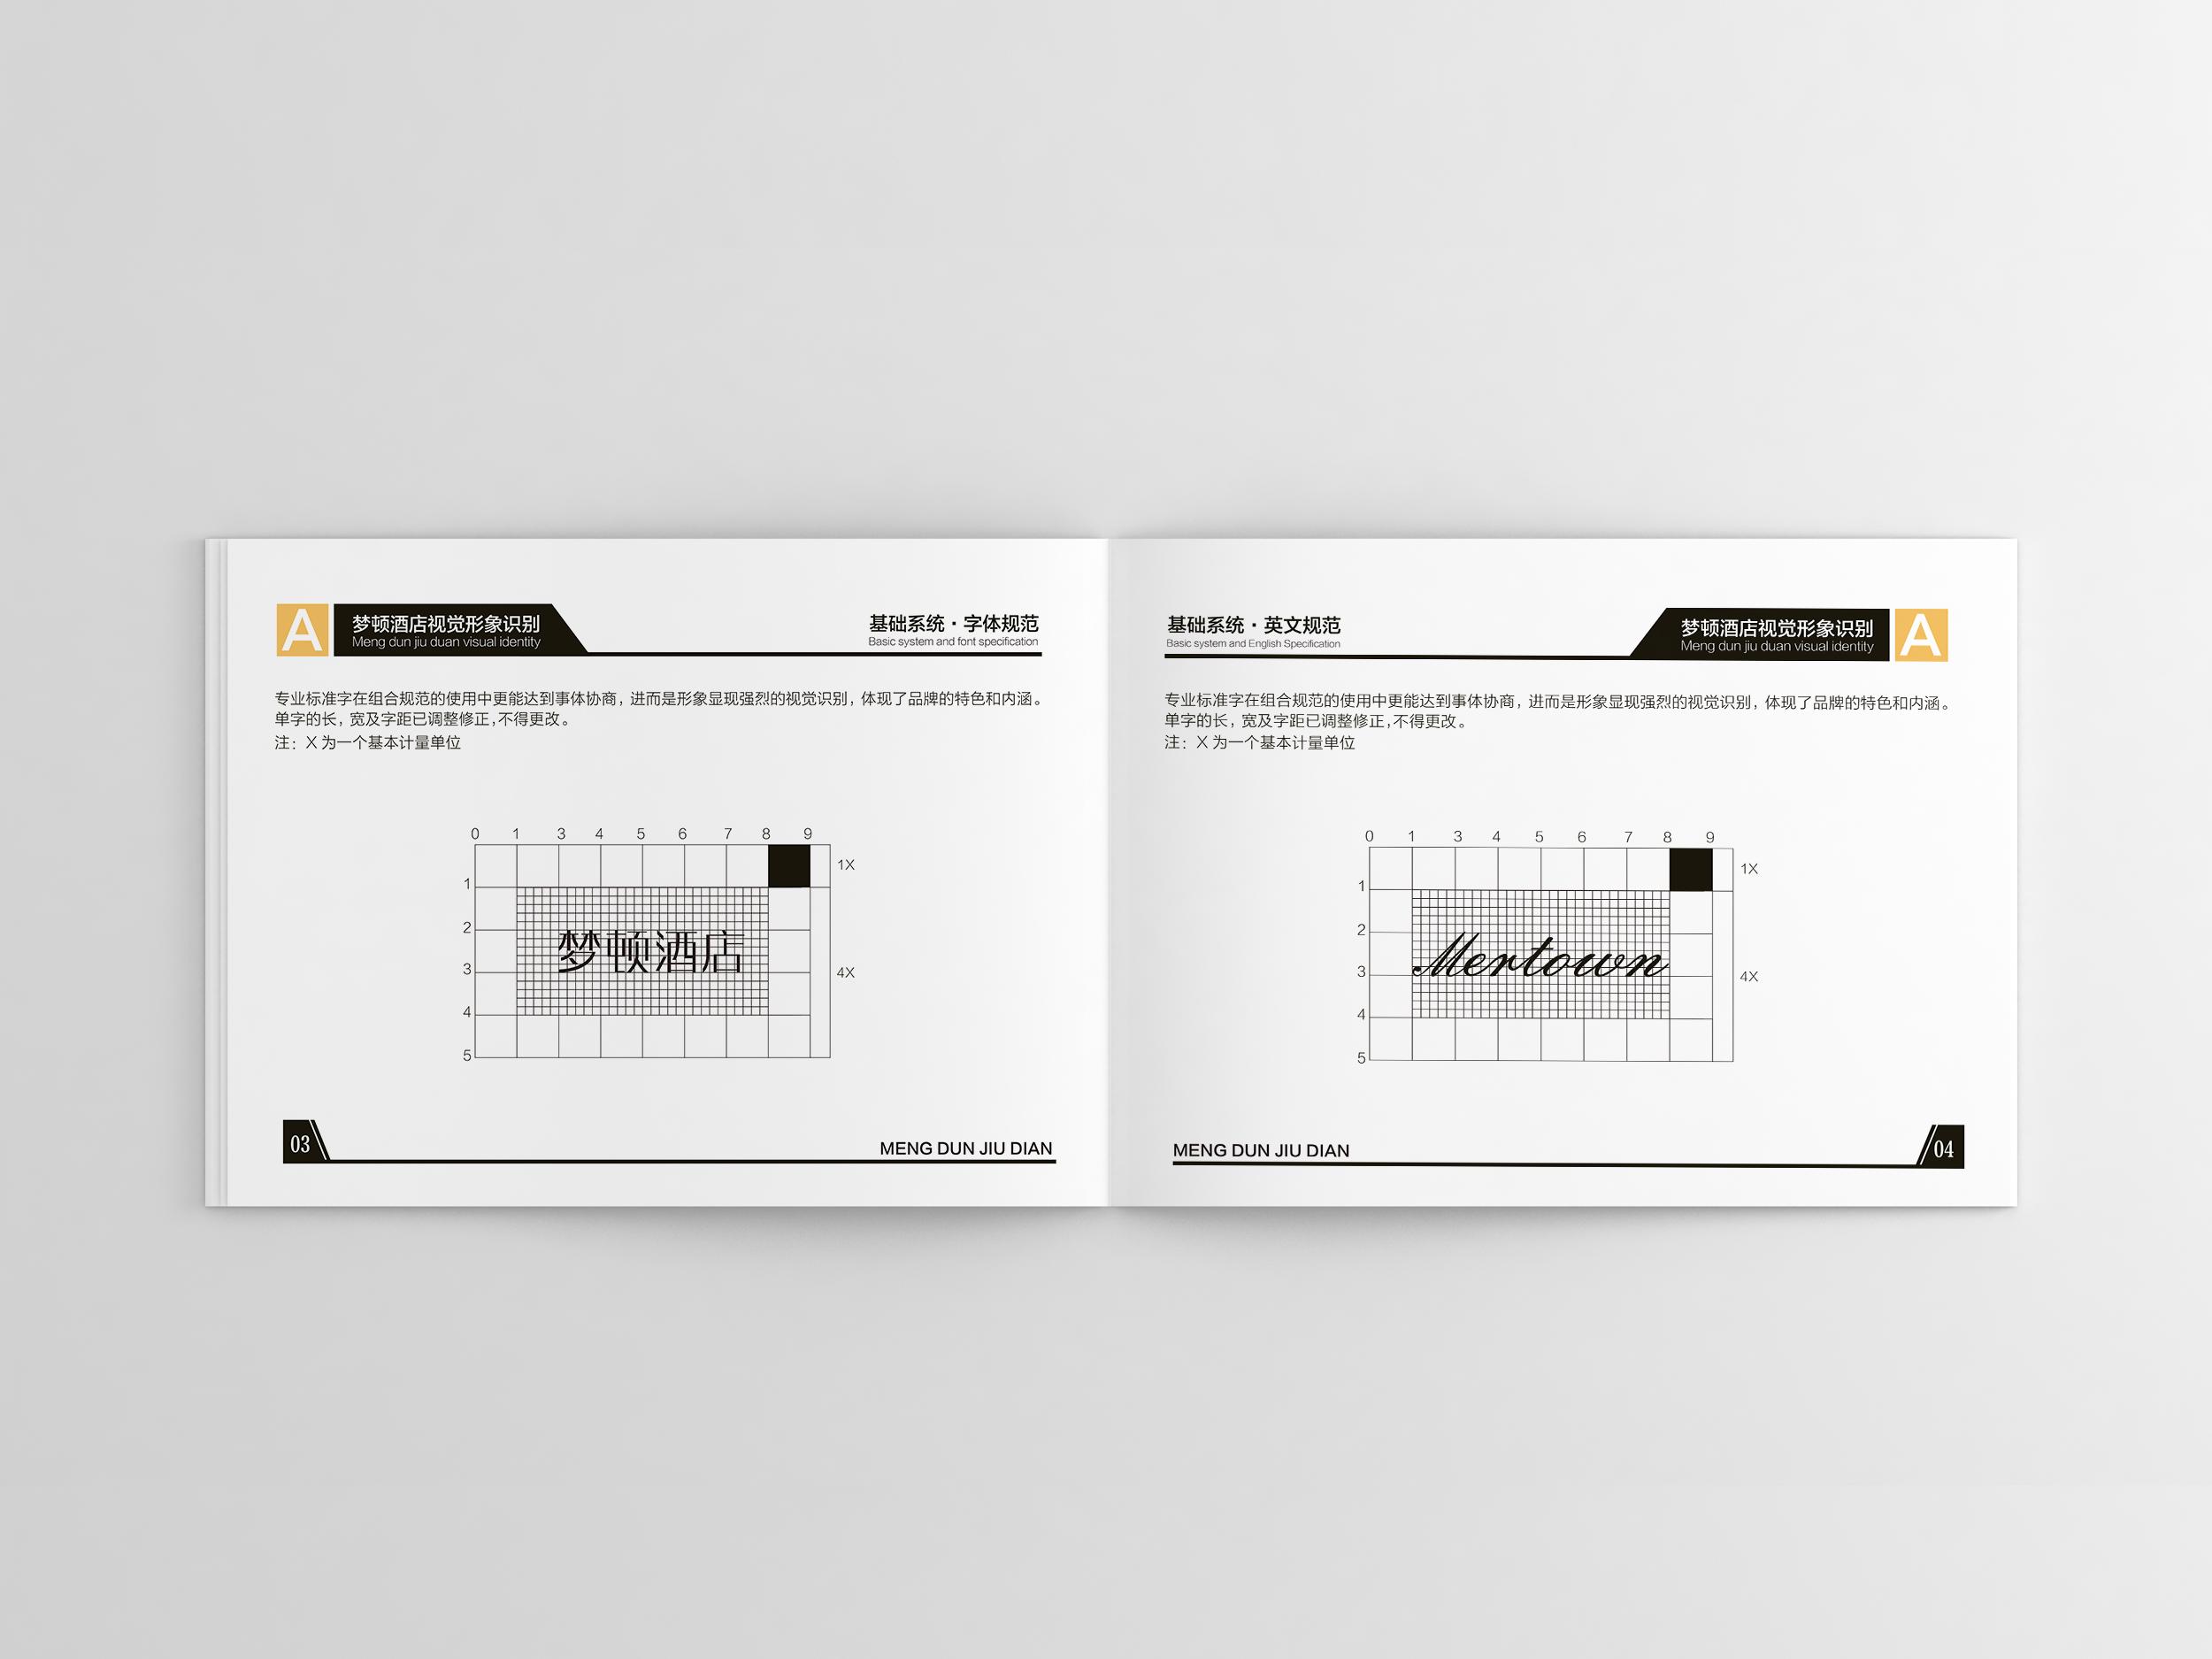 4444vi_酒店vi应用手册设计